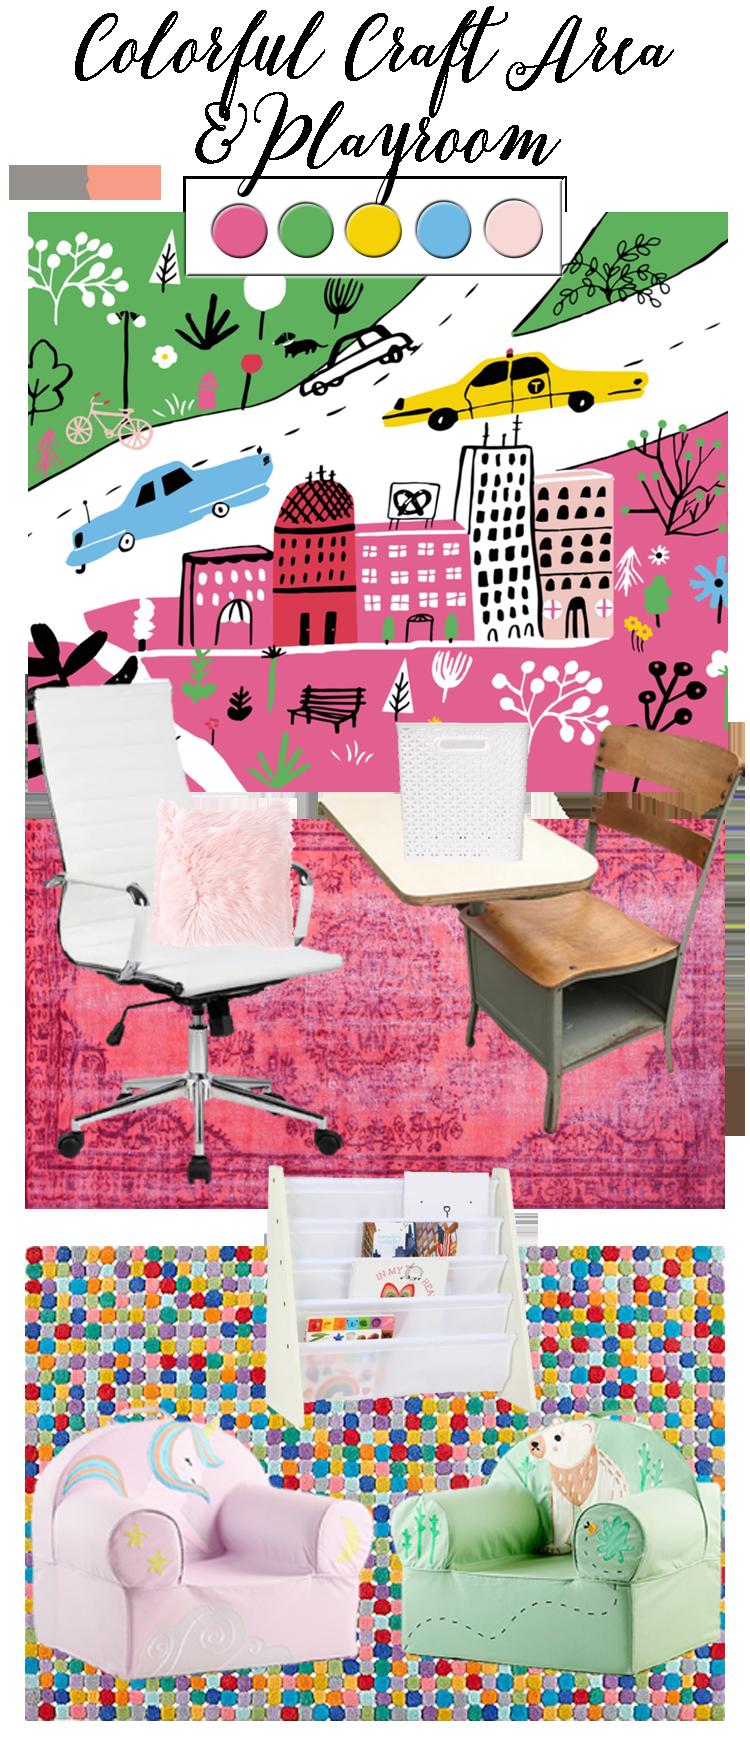 Colorful Craft Area & Playroom Design Board